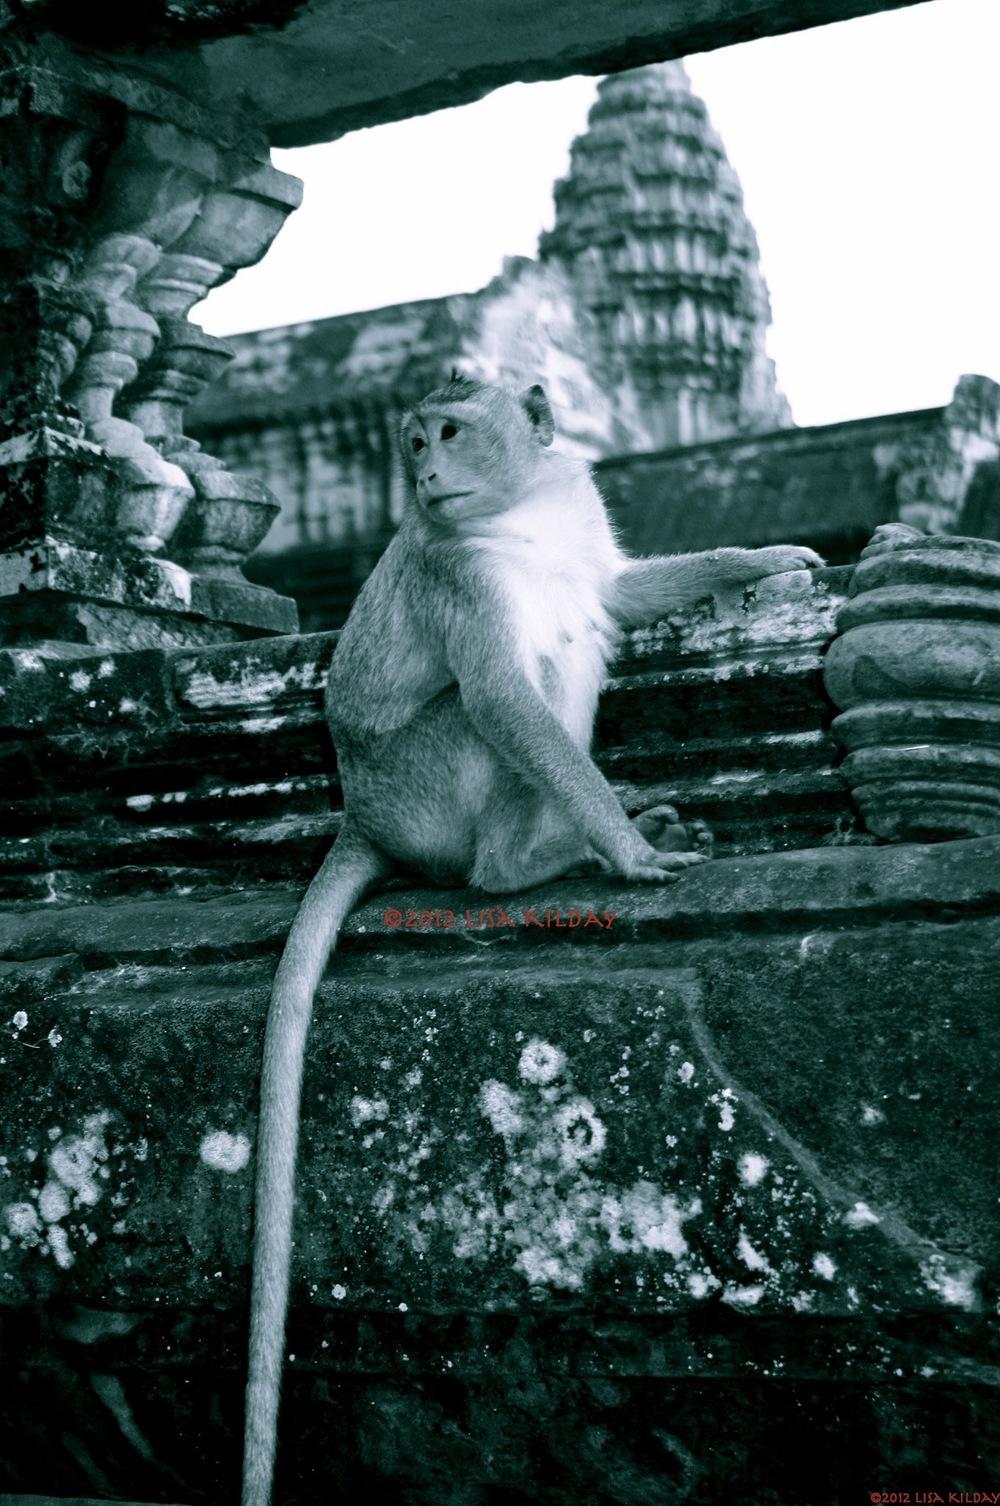 Monkey Brain